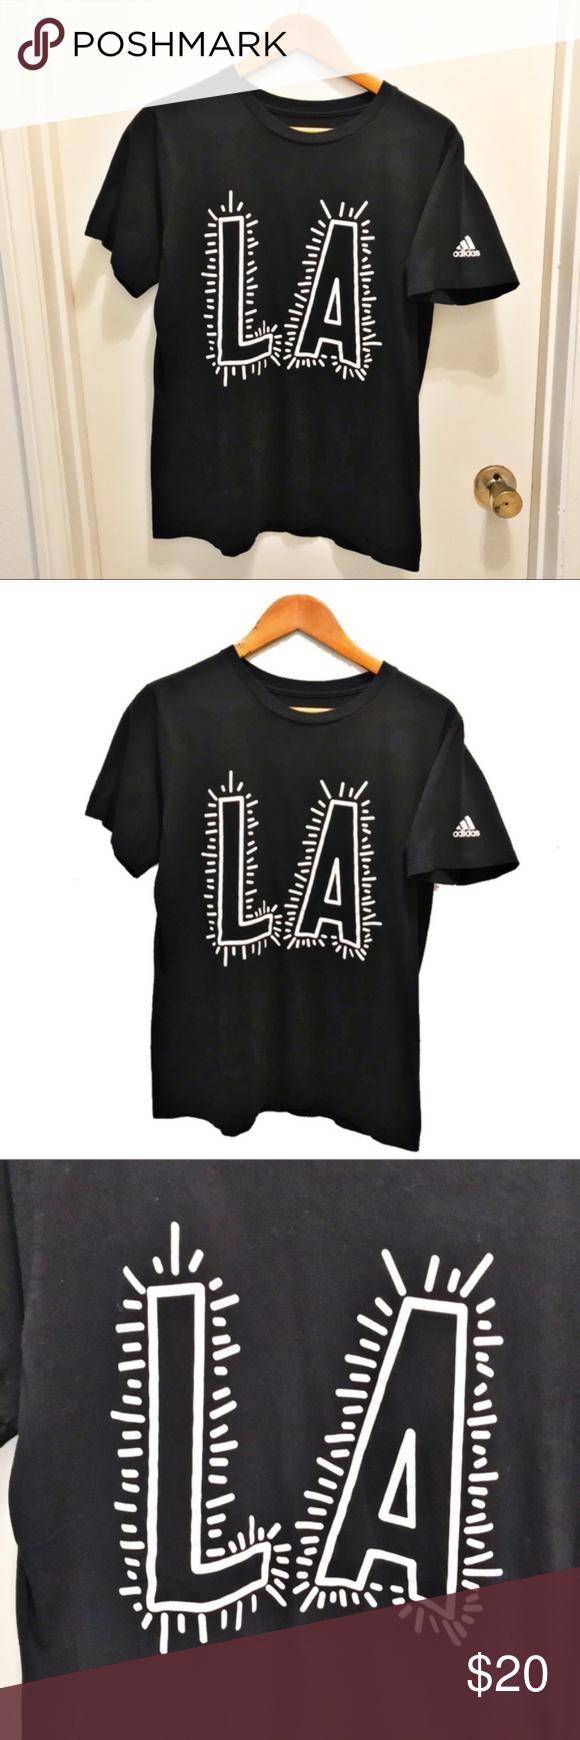 Adidas The Go To Tee La Black White Shirt Medium Black And White Shirt Black Shirt Shirts